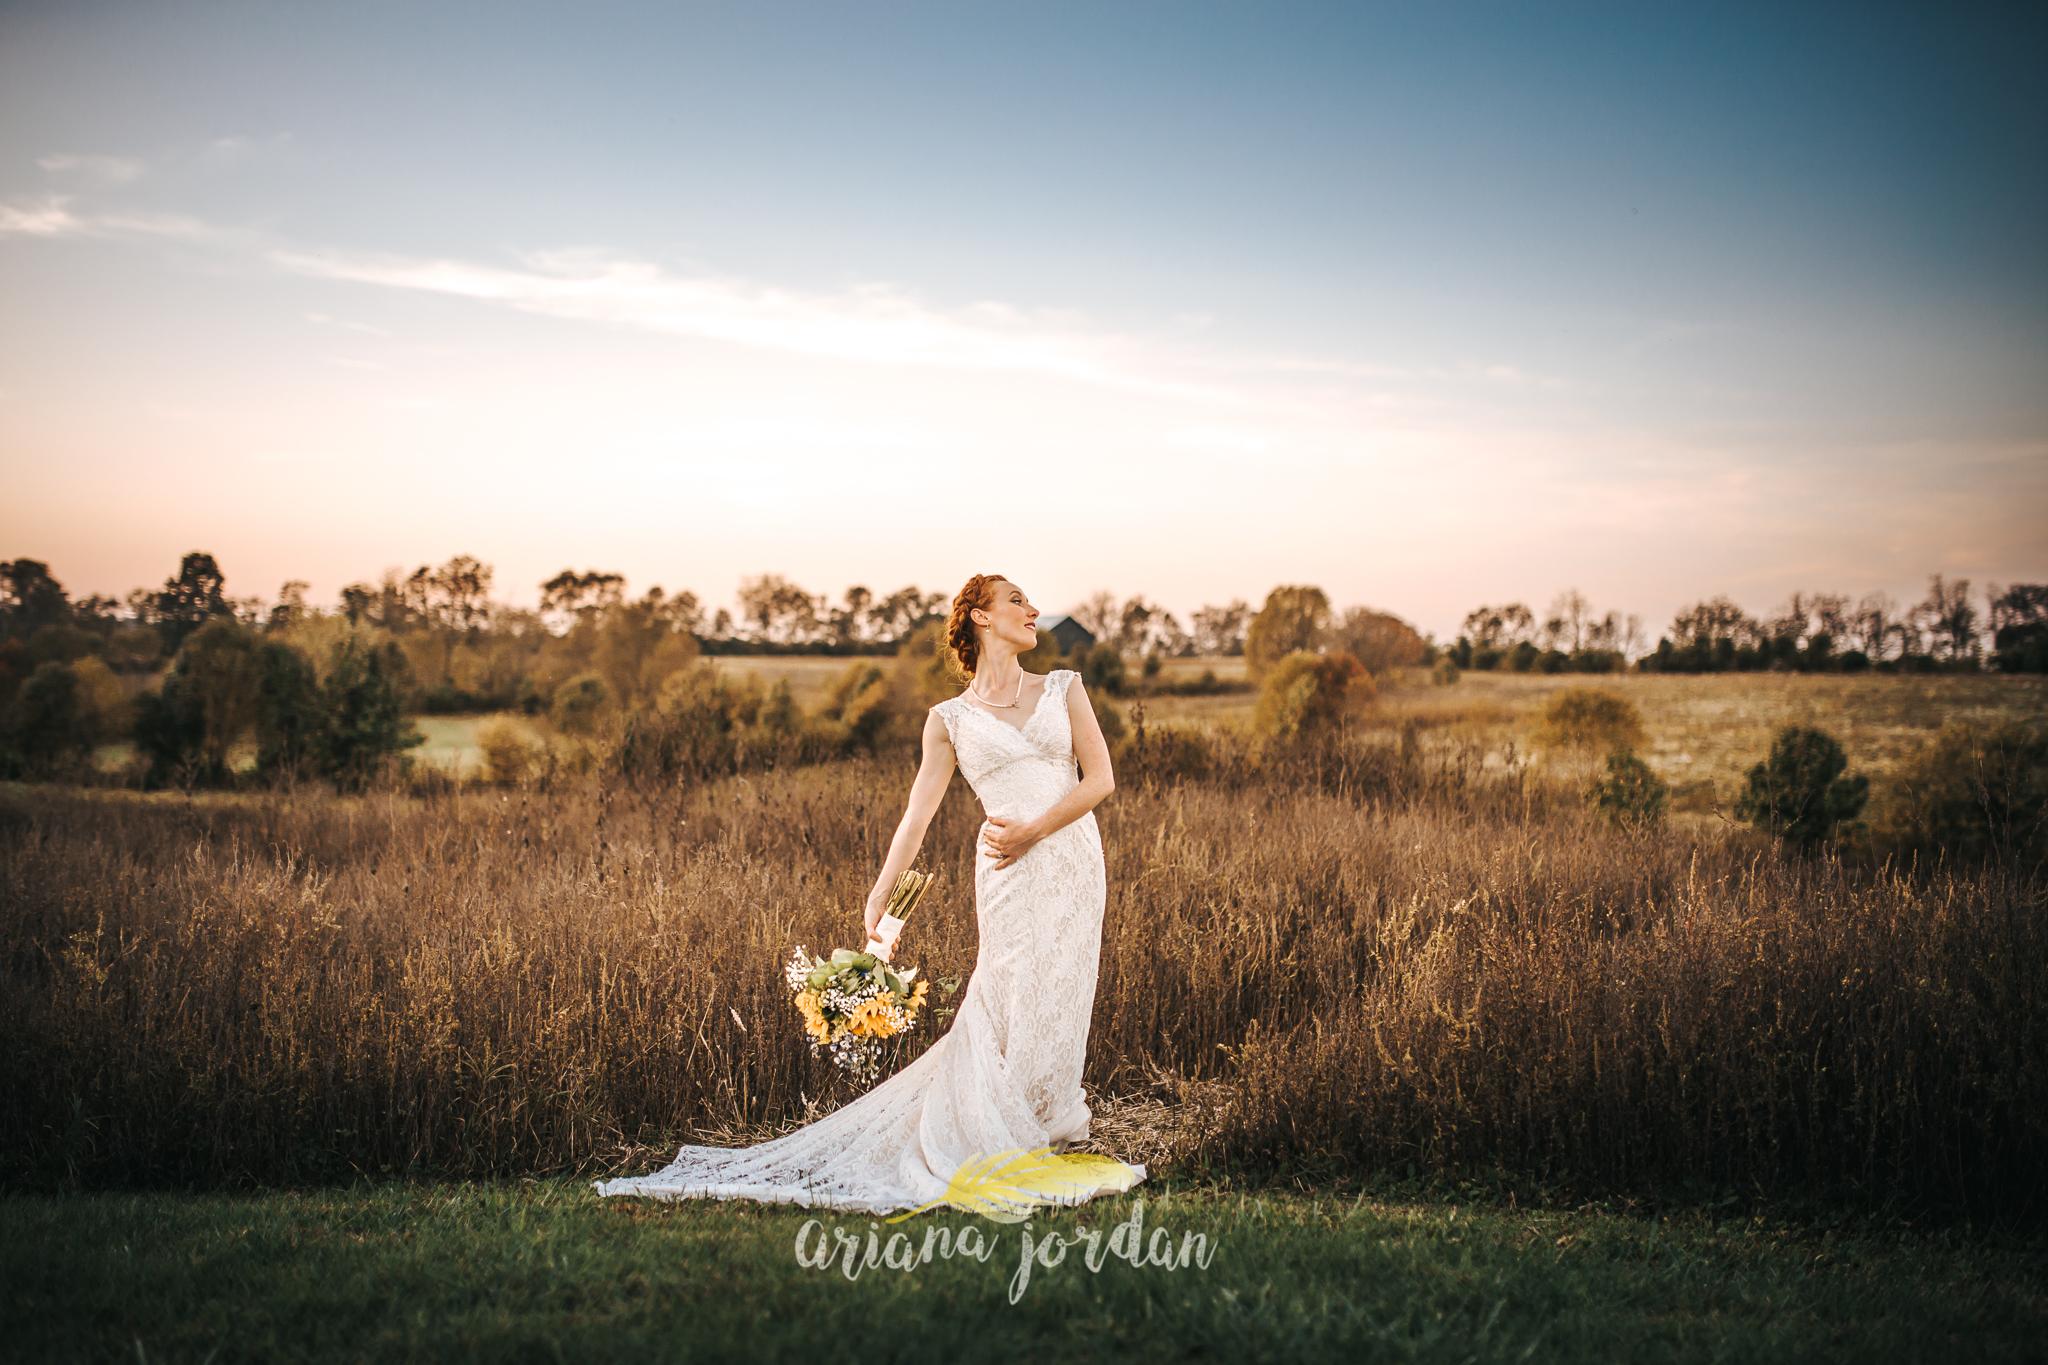 139 Ariana Jordan Photography -Moonlight Fields Lexington Ky Wedding Photographer 2109.jpg